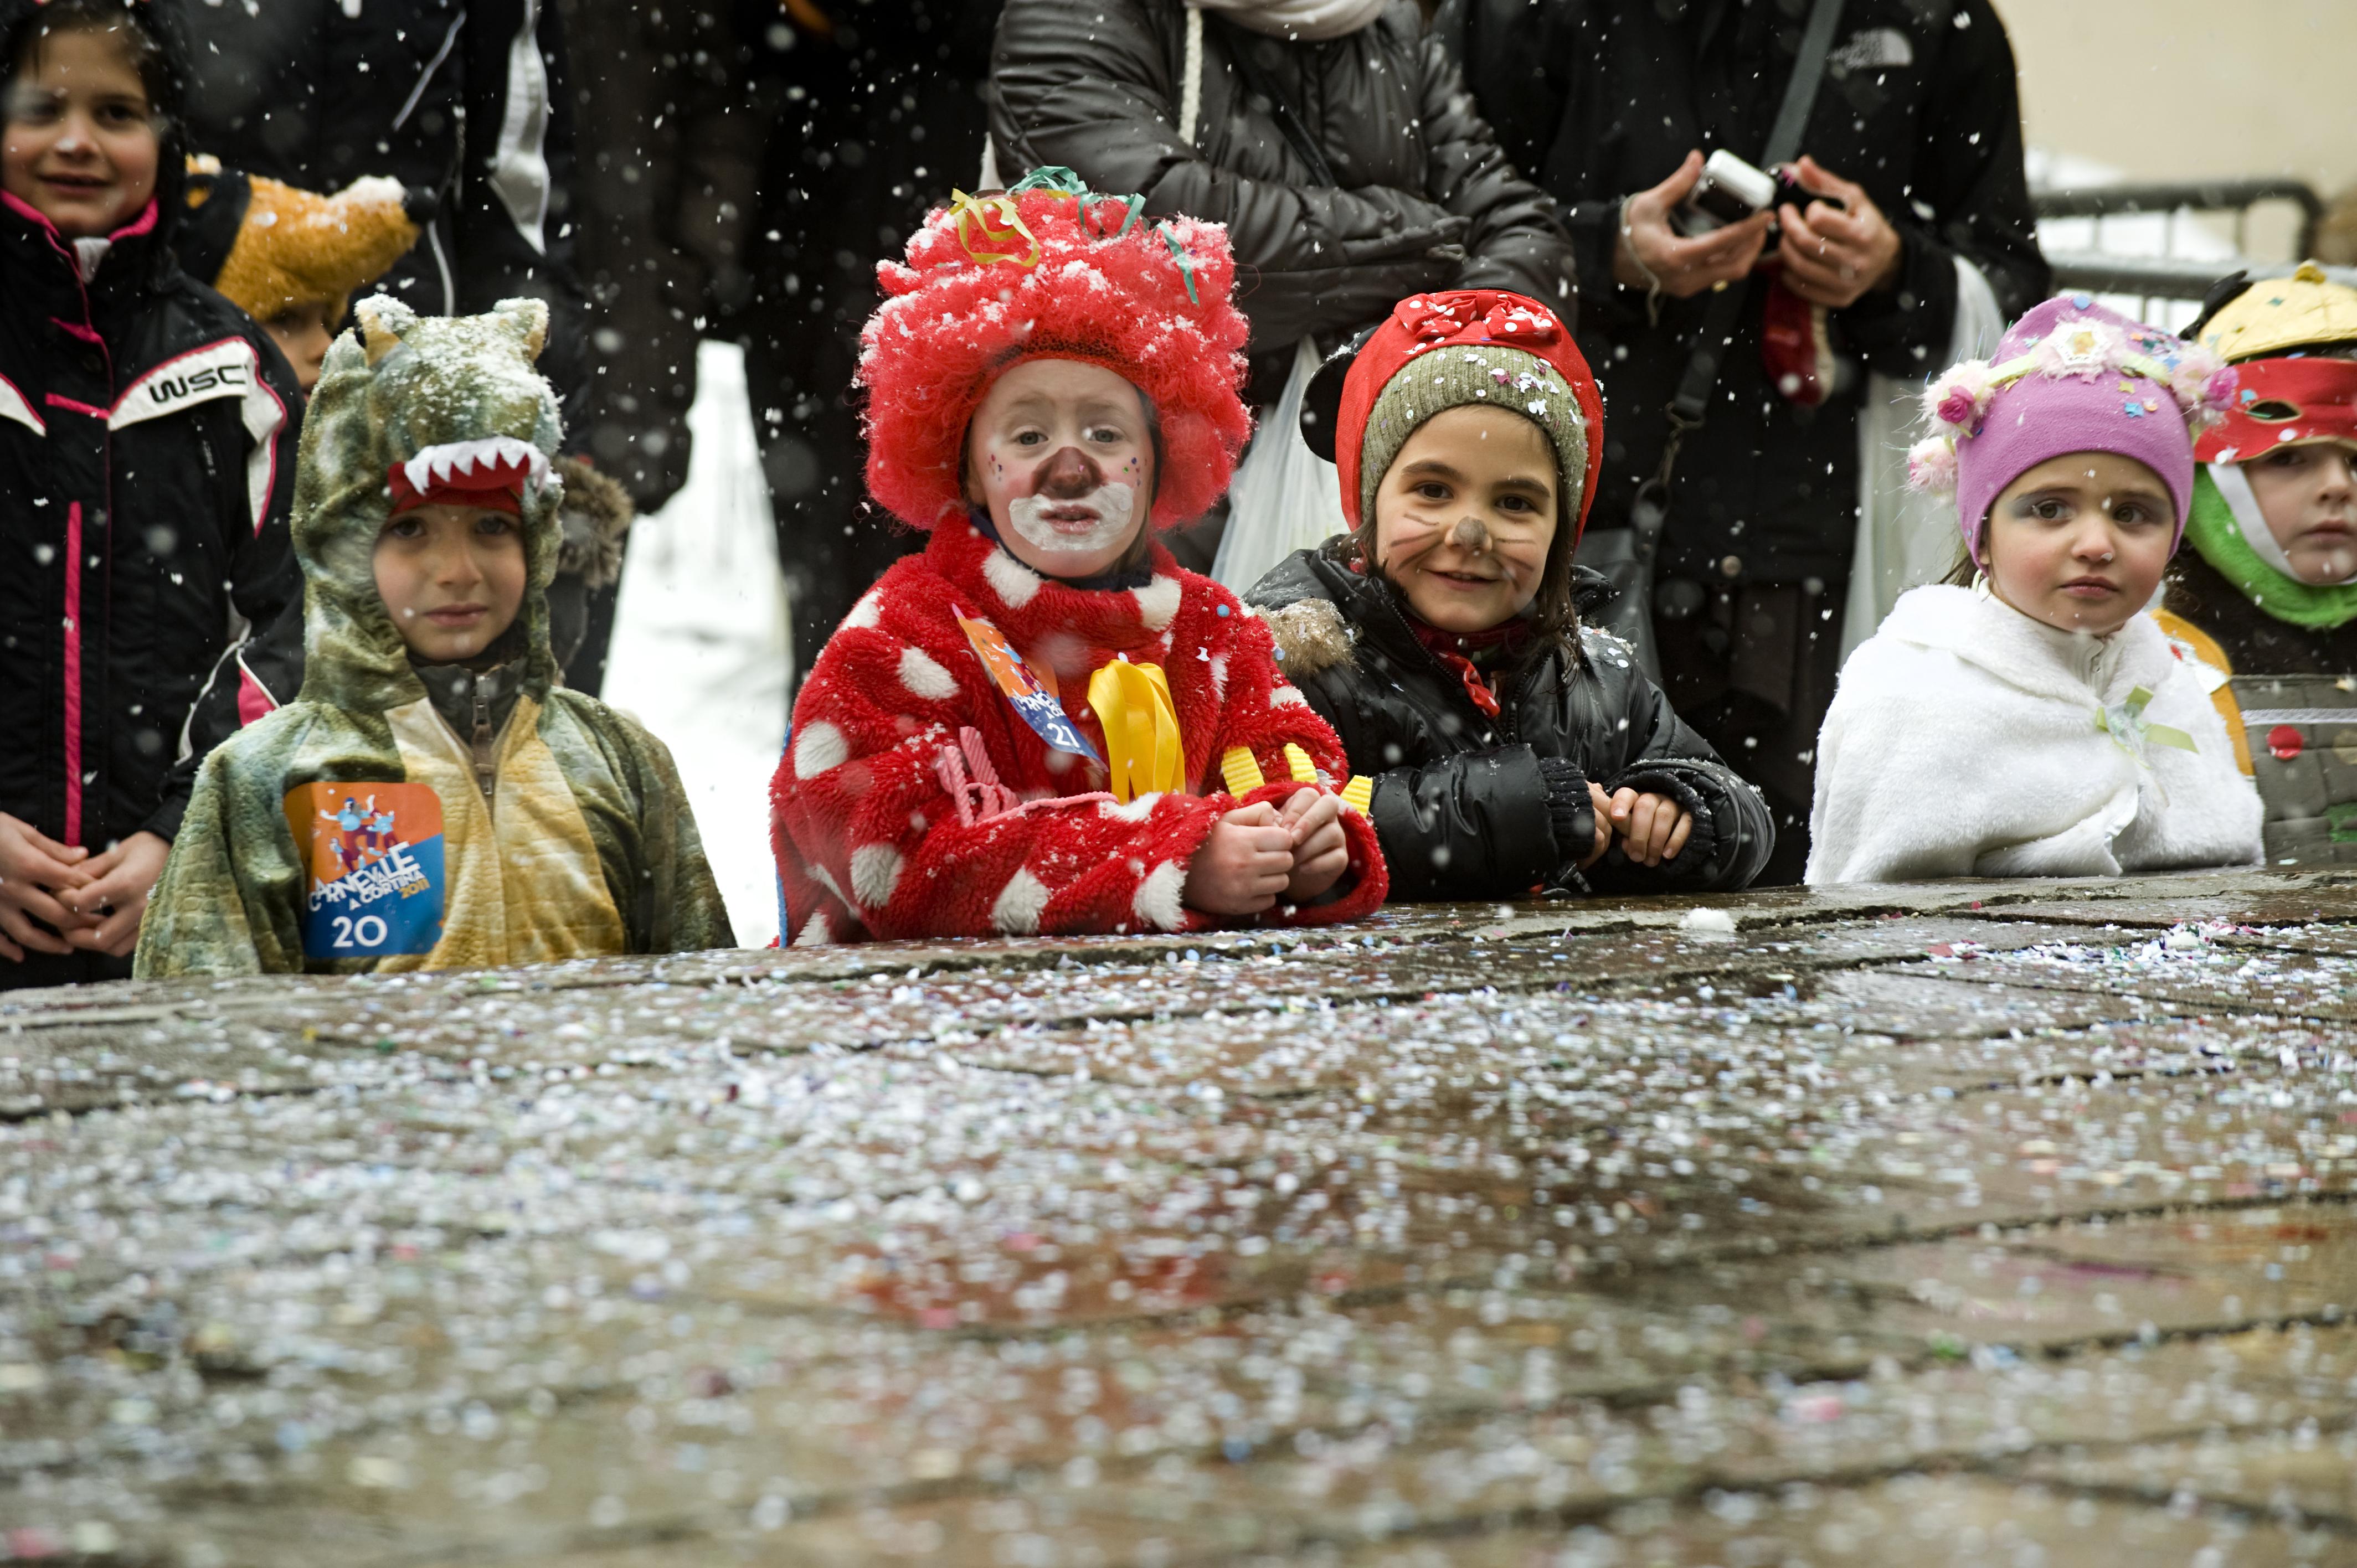 Cortina_Carnevale_Centro_2011_GiacomoPompanin (4)